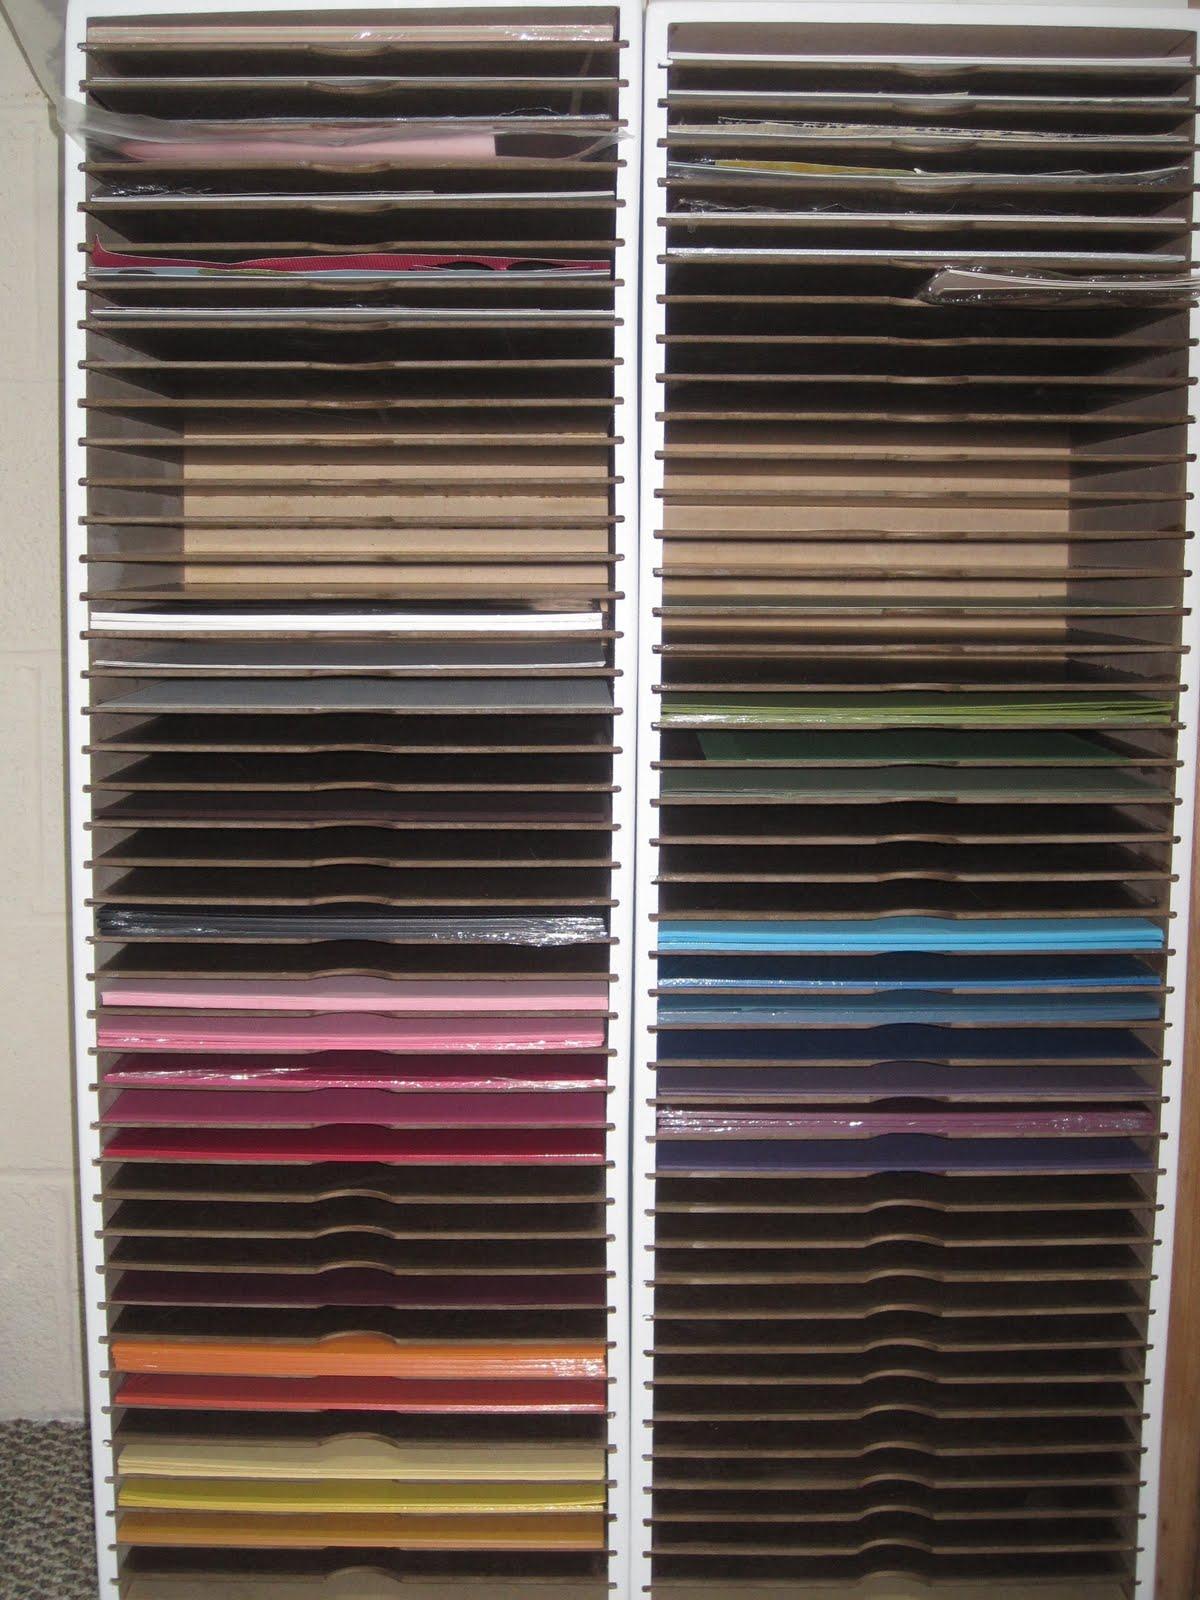 1000 images about craft organization on pinterest scrapbook paper storage paper storage and. Black Bedroom Furniture Sets. Home Design Ideas